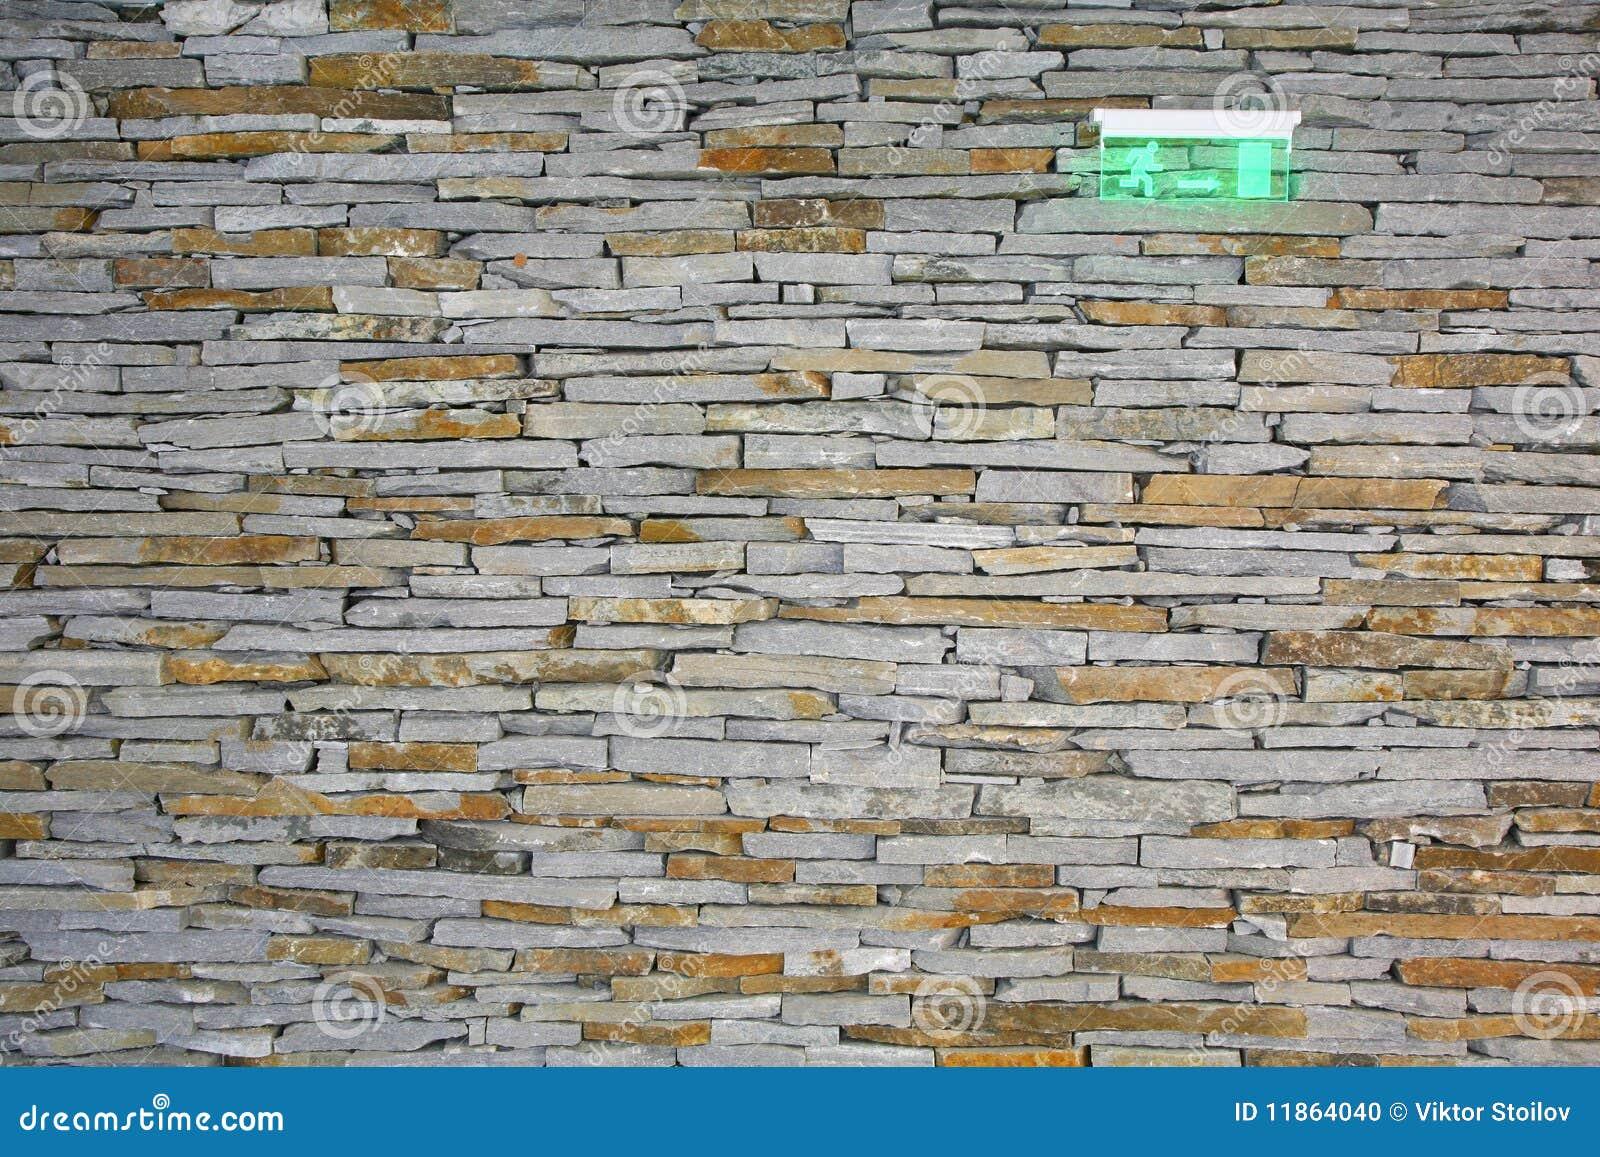 Pared de piedra decorativa foto de archivo imagen 11864040 - Piedra decorativa para paredes ...